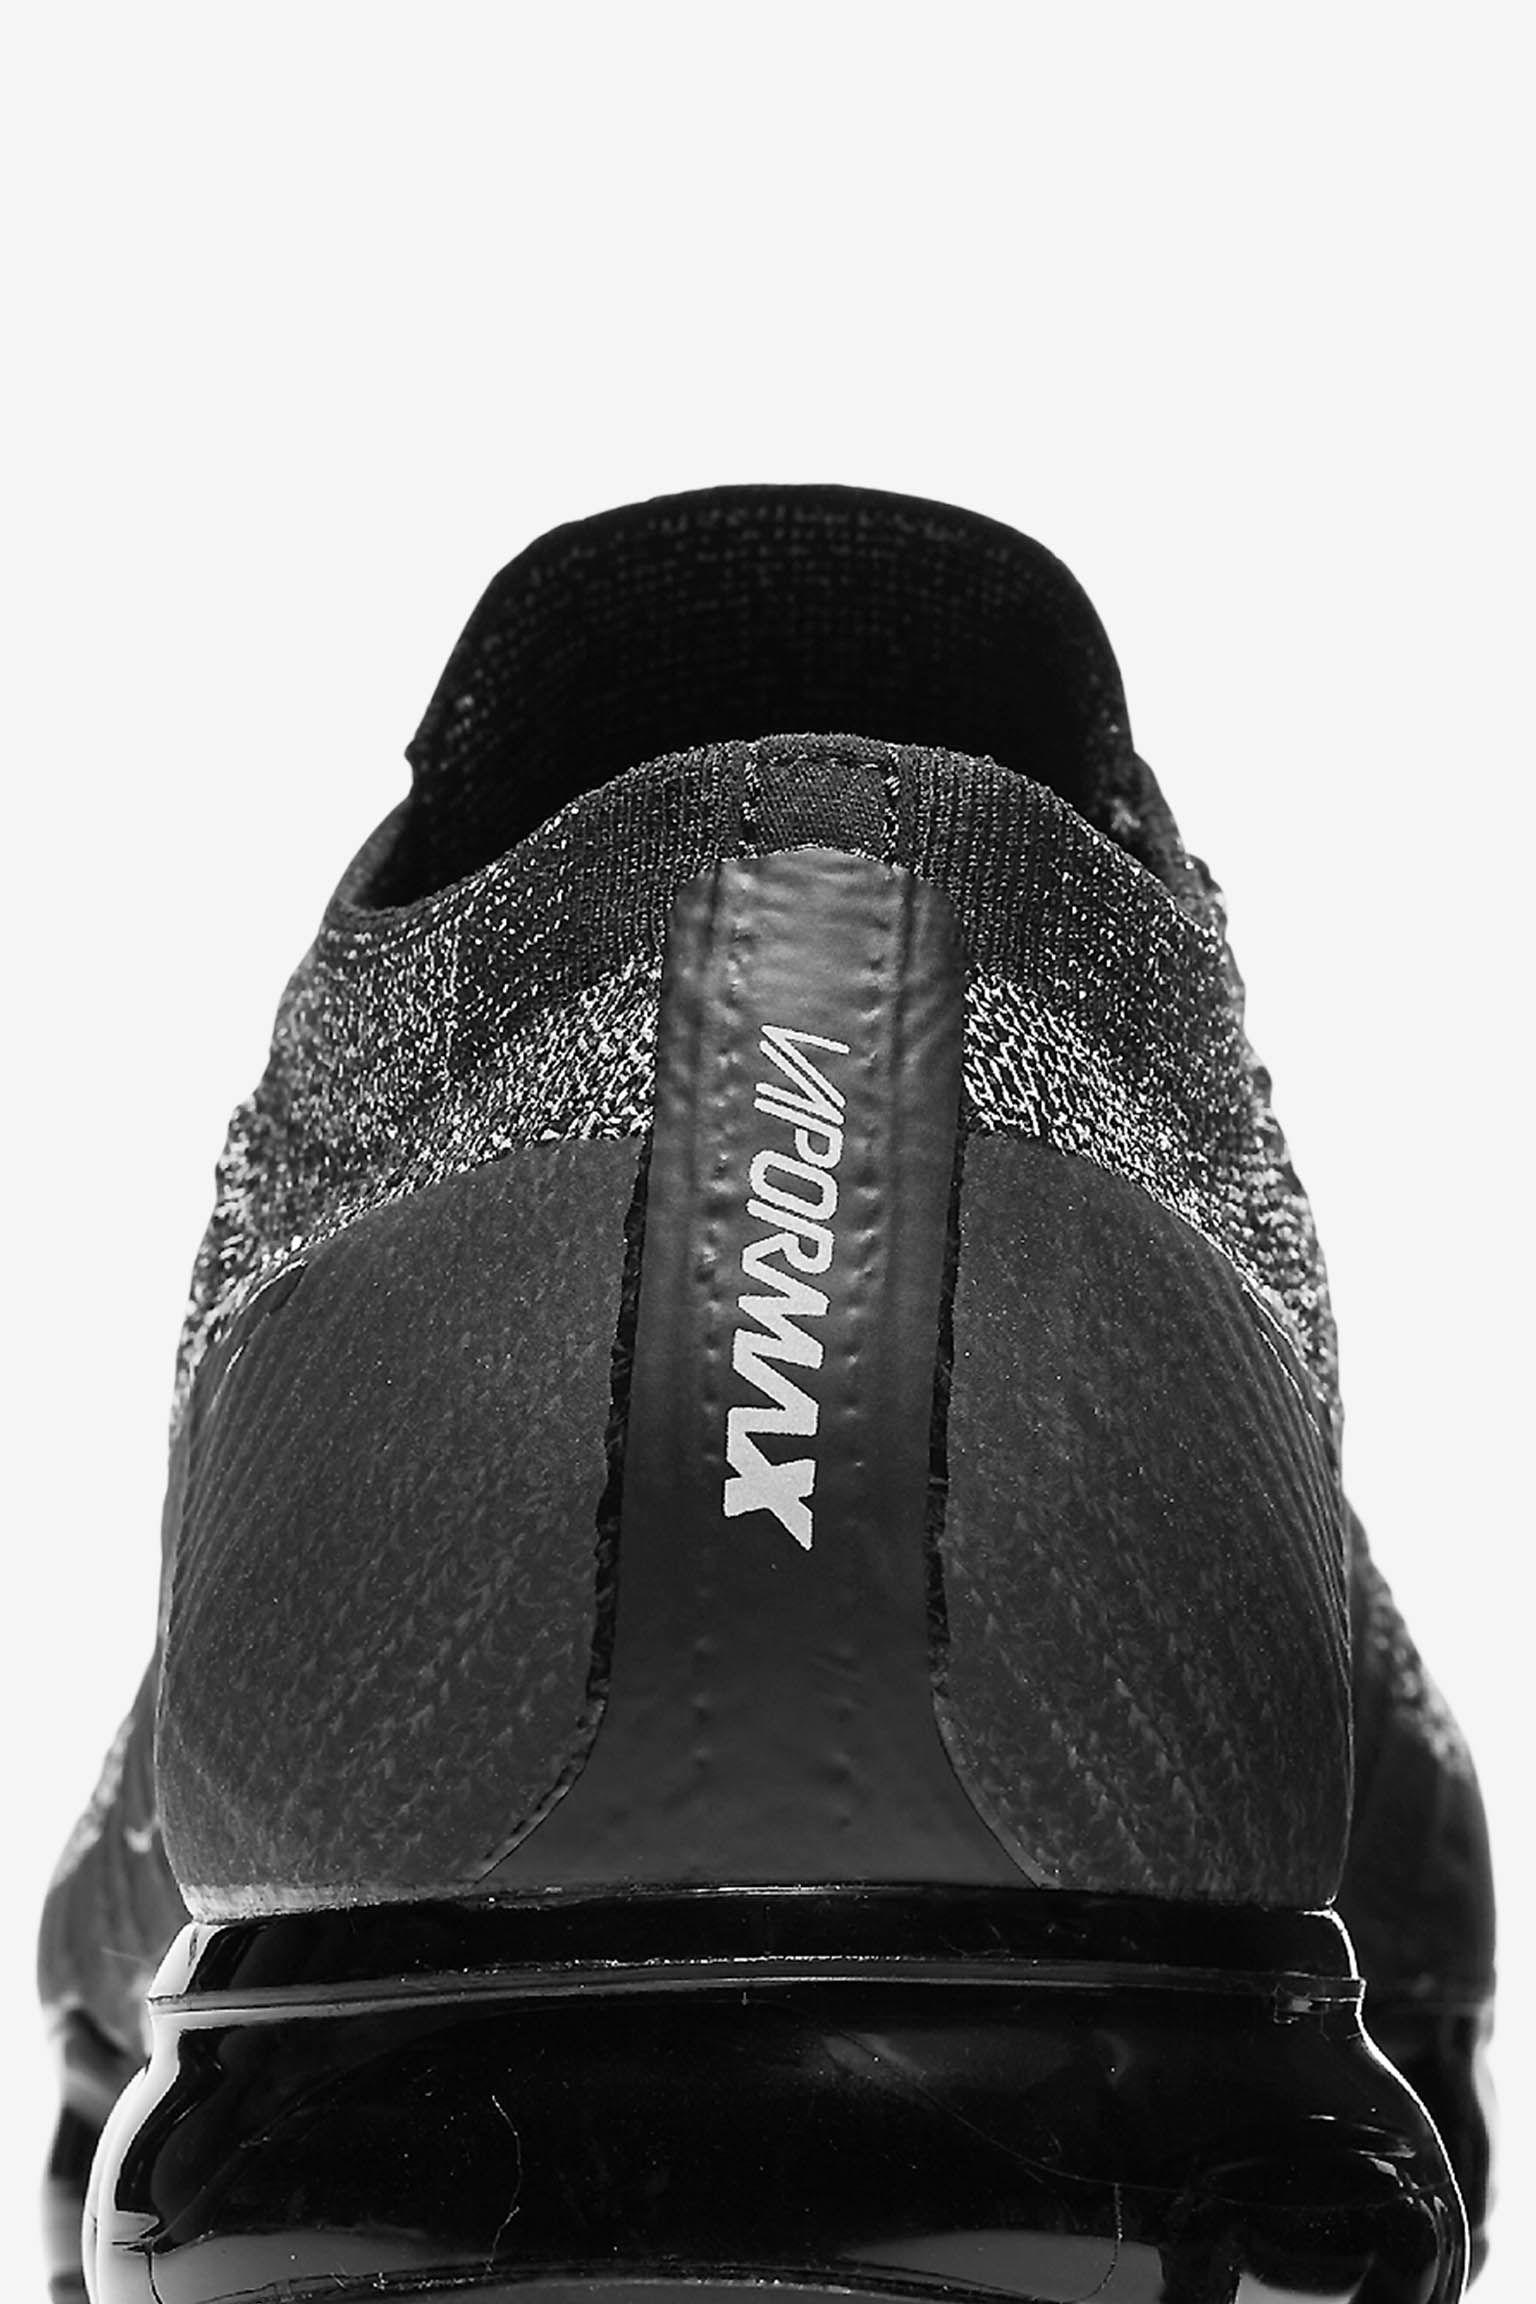 Nike Air VaporMax 'Cookies & Cream' Release Date